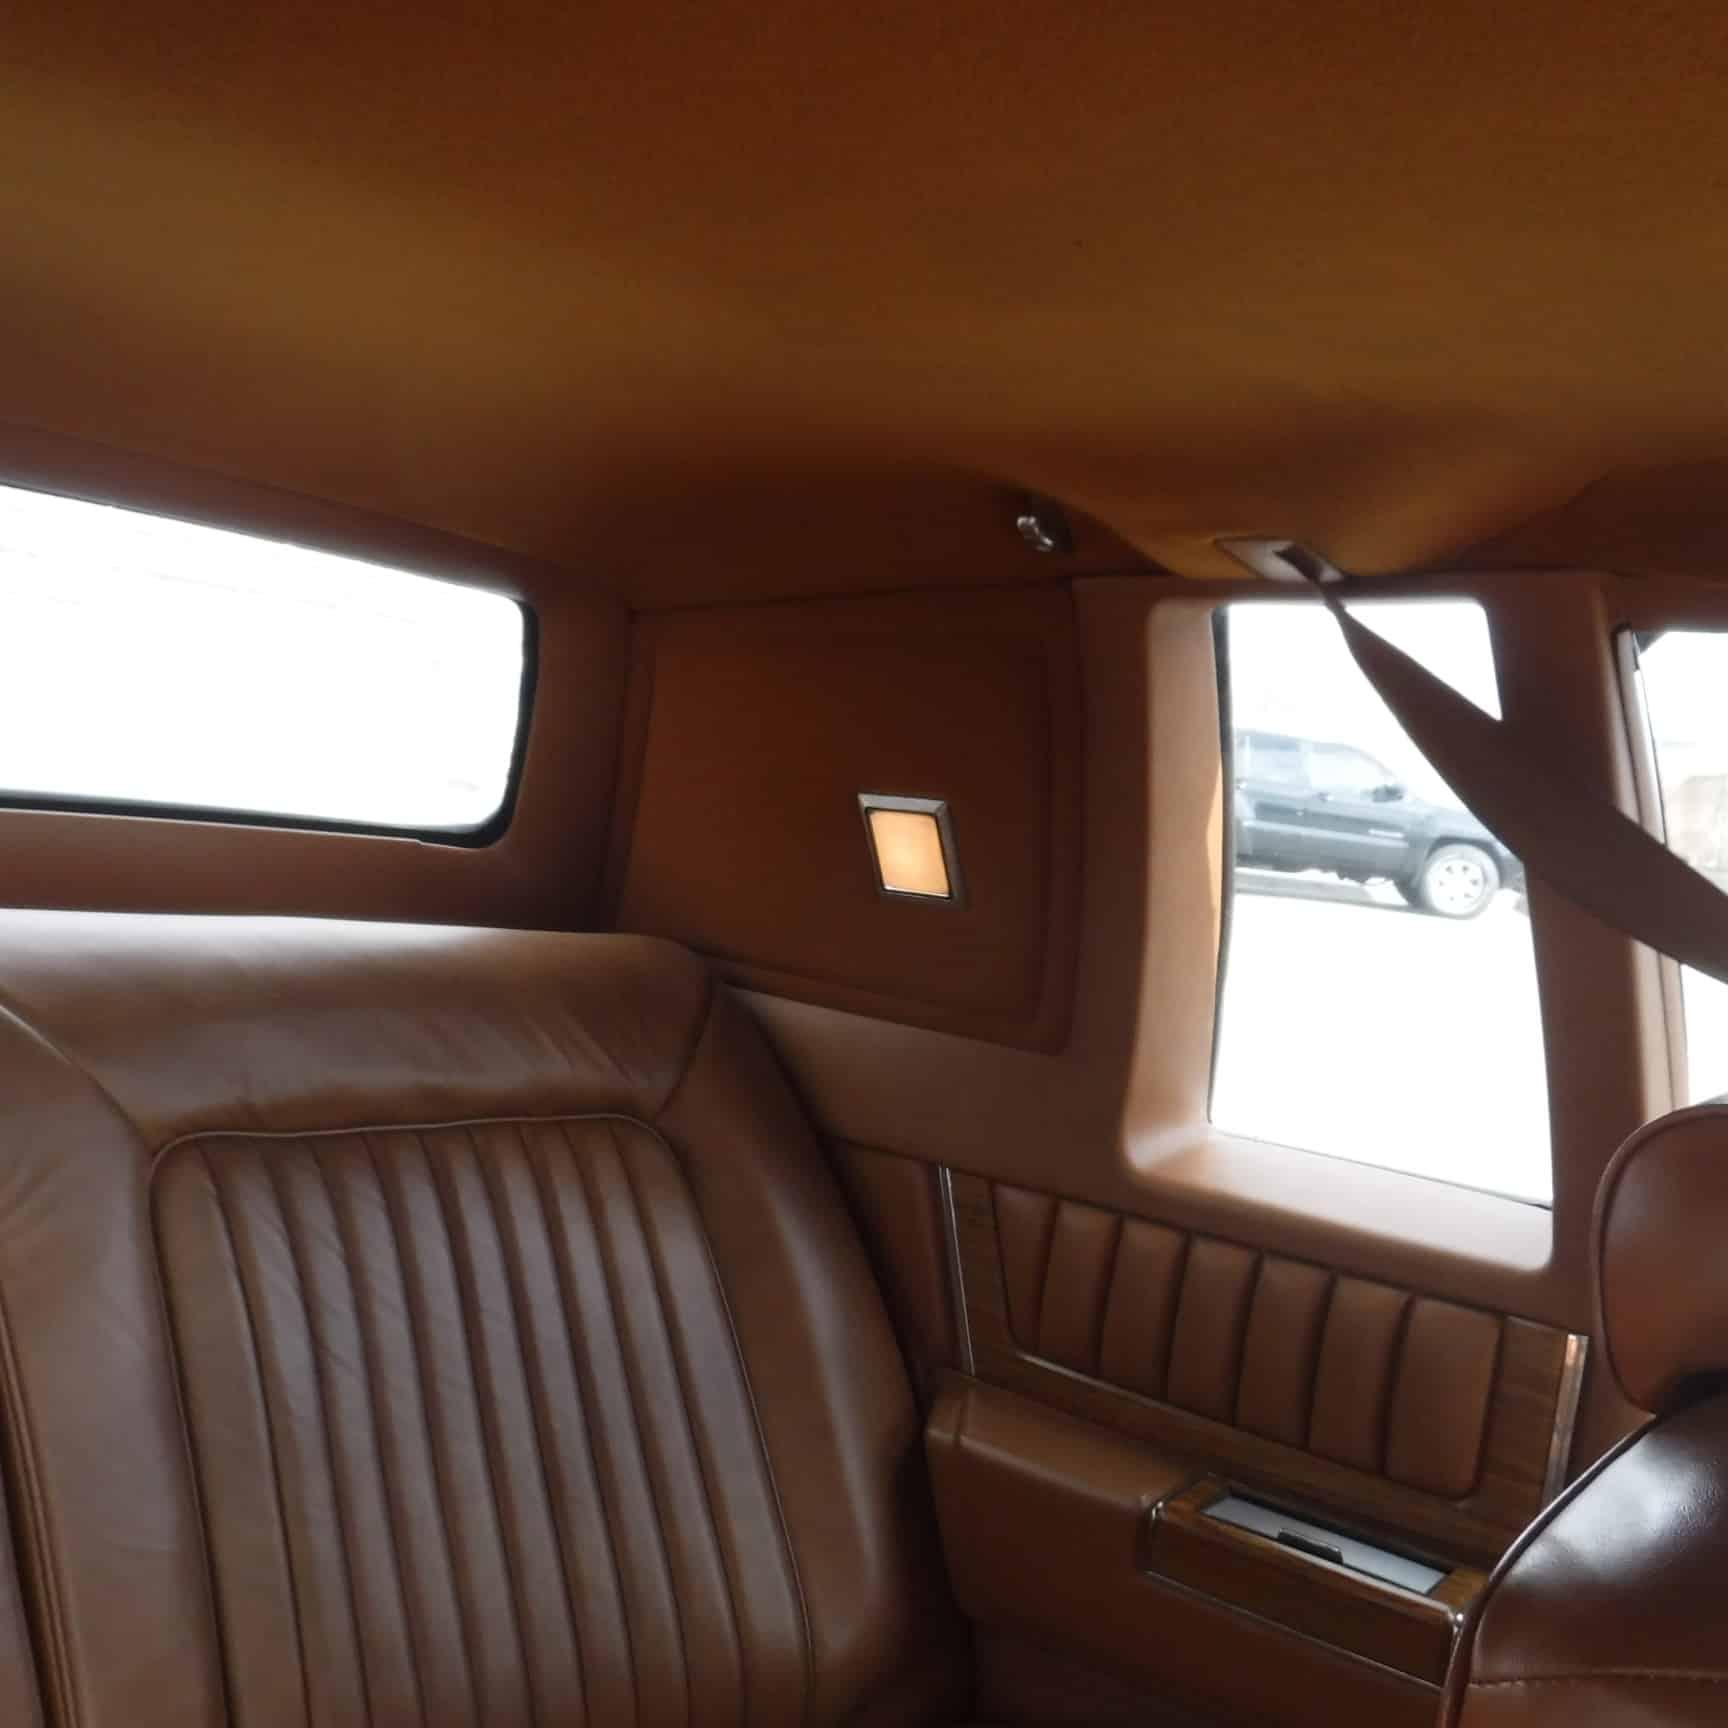 1980 Cadillac 079